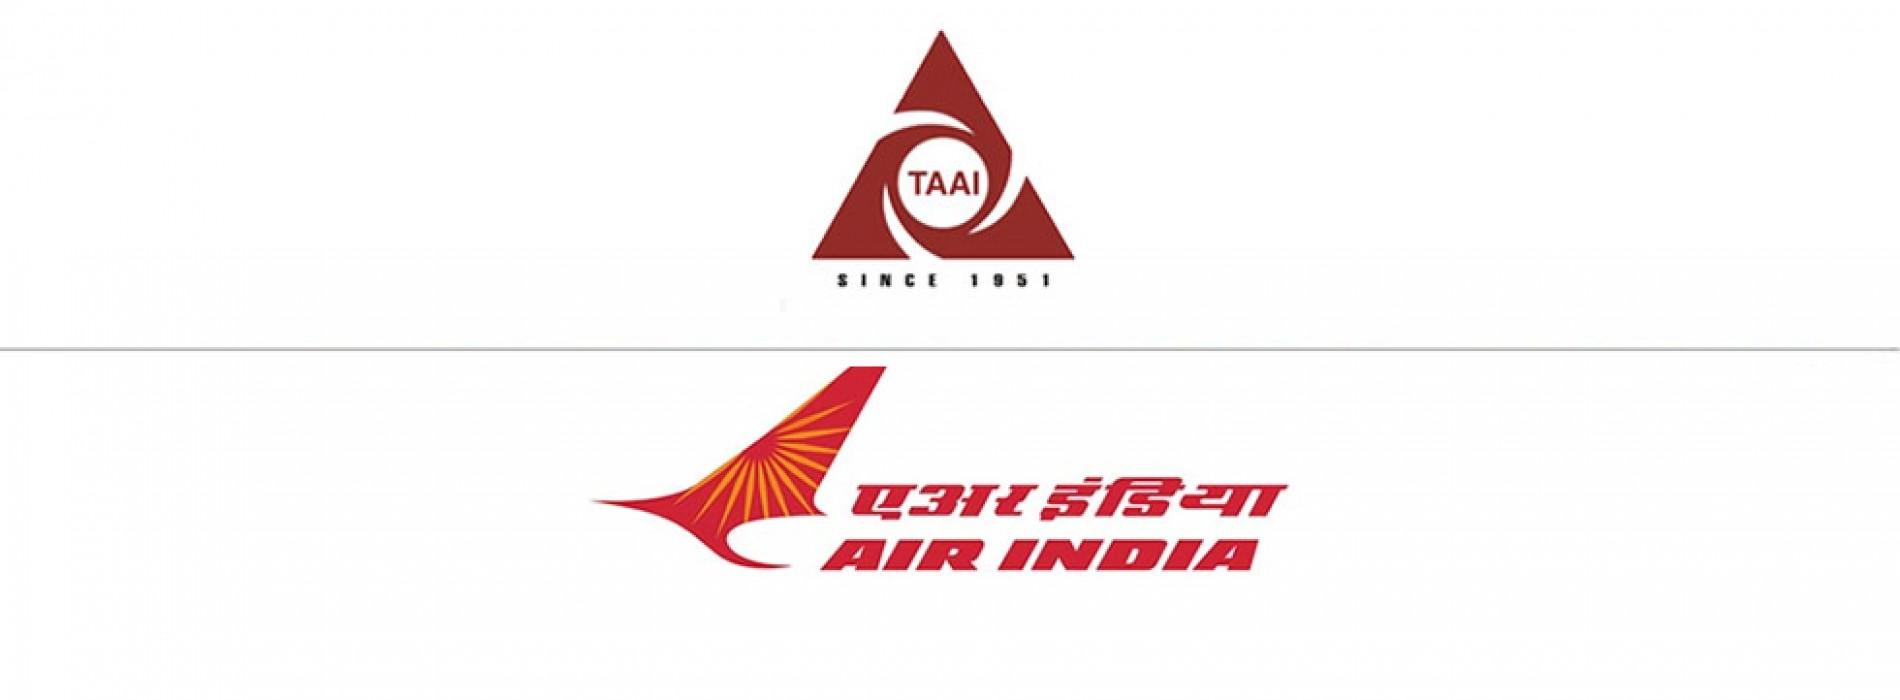 TAAI & Air India Meeting Yield Results